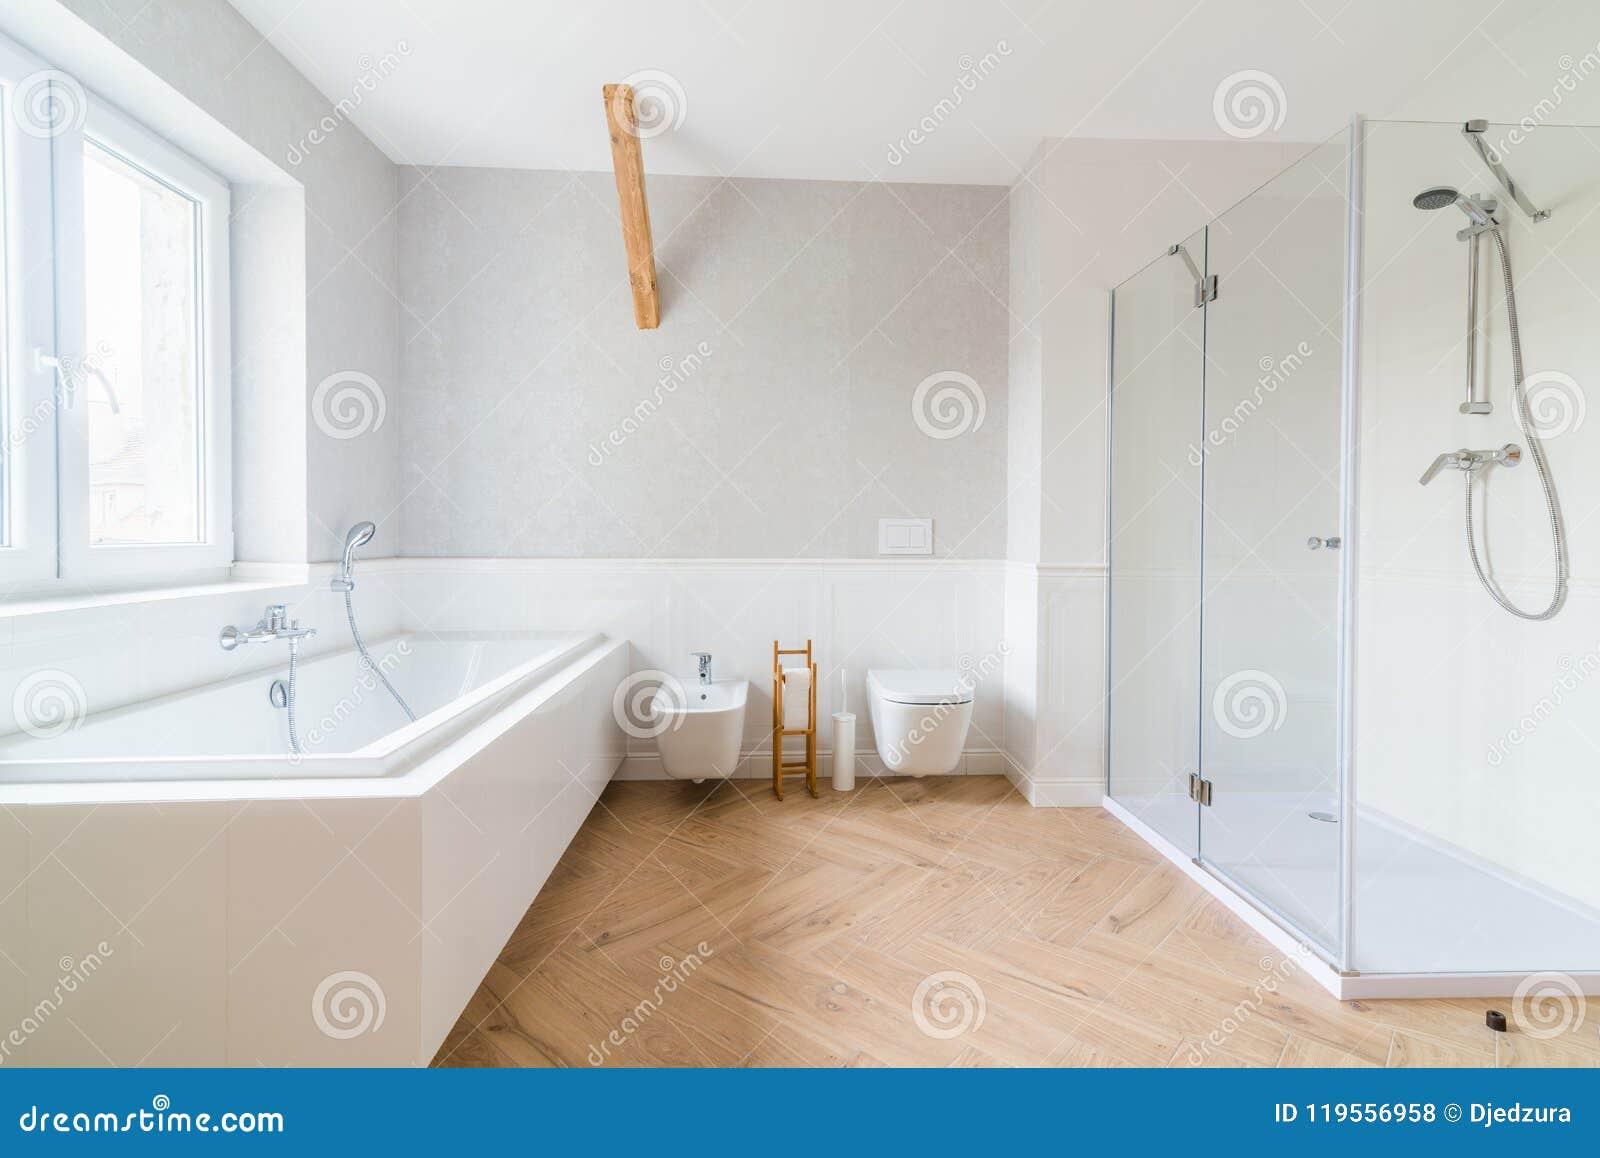 Bathtub And Glass Shower Cabin In Loft Bathroom. Stock Photo - Image ...